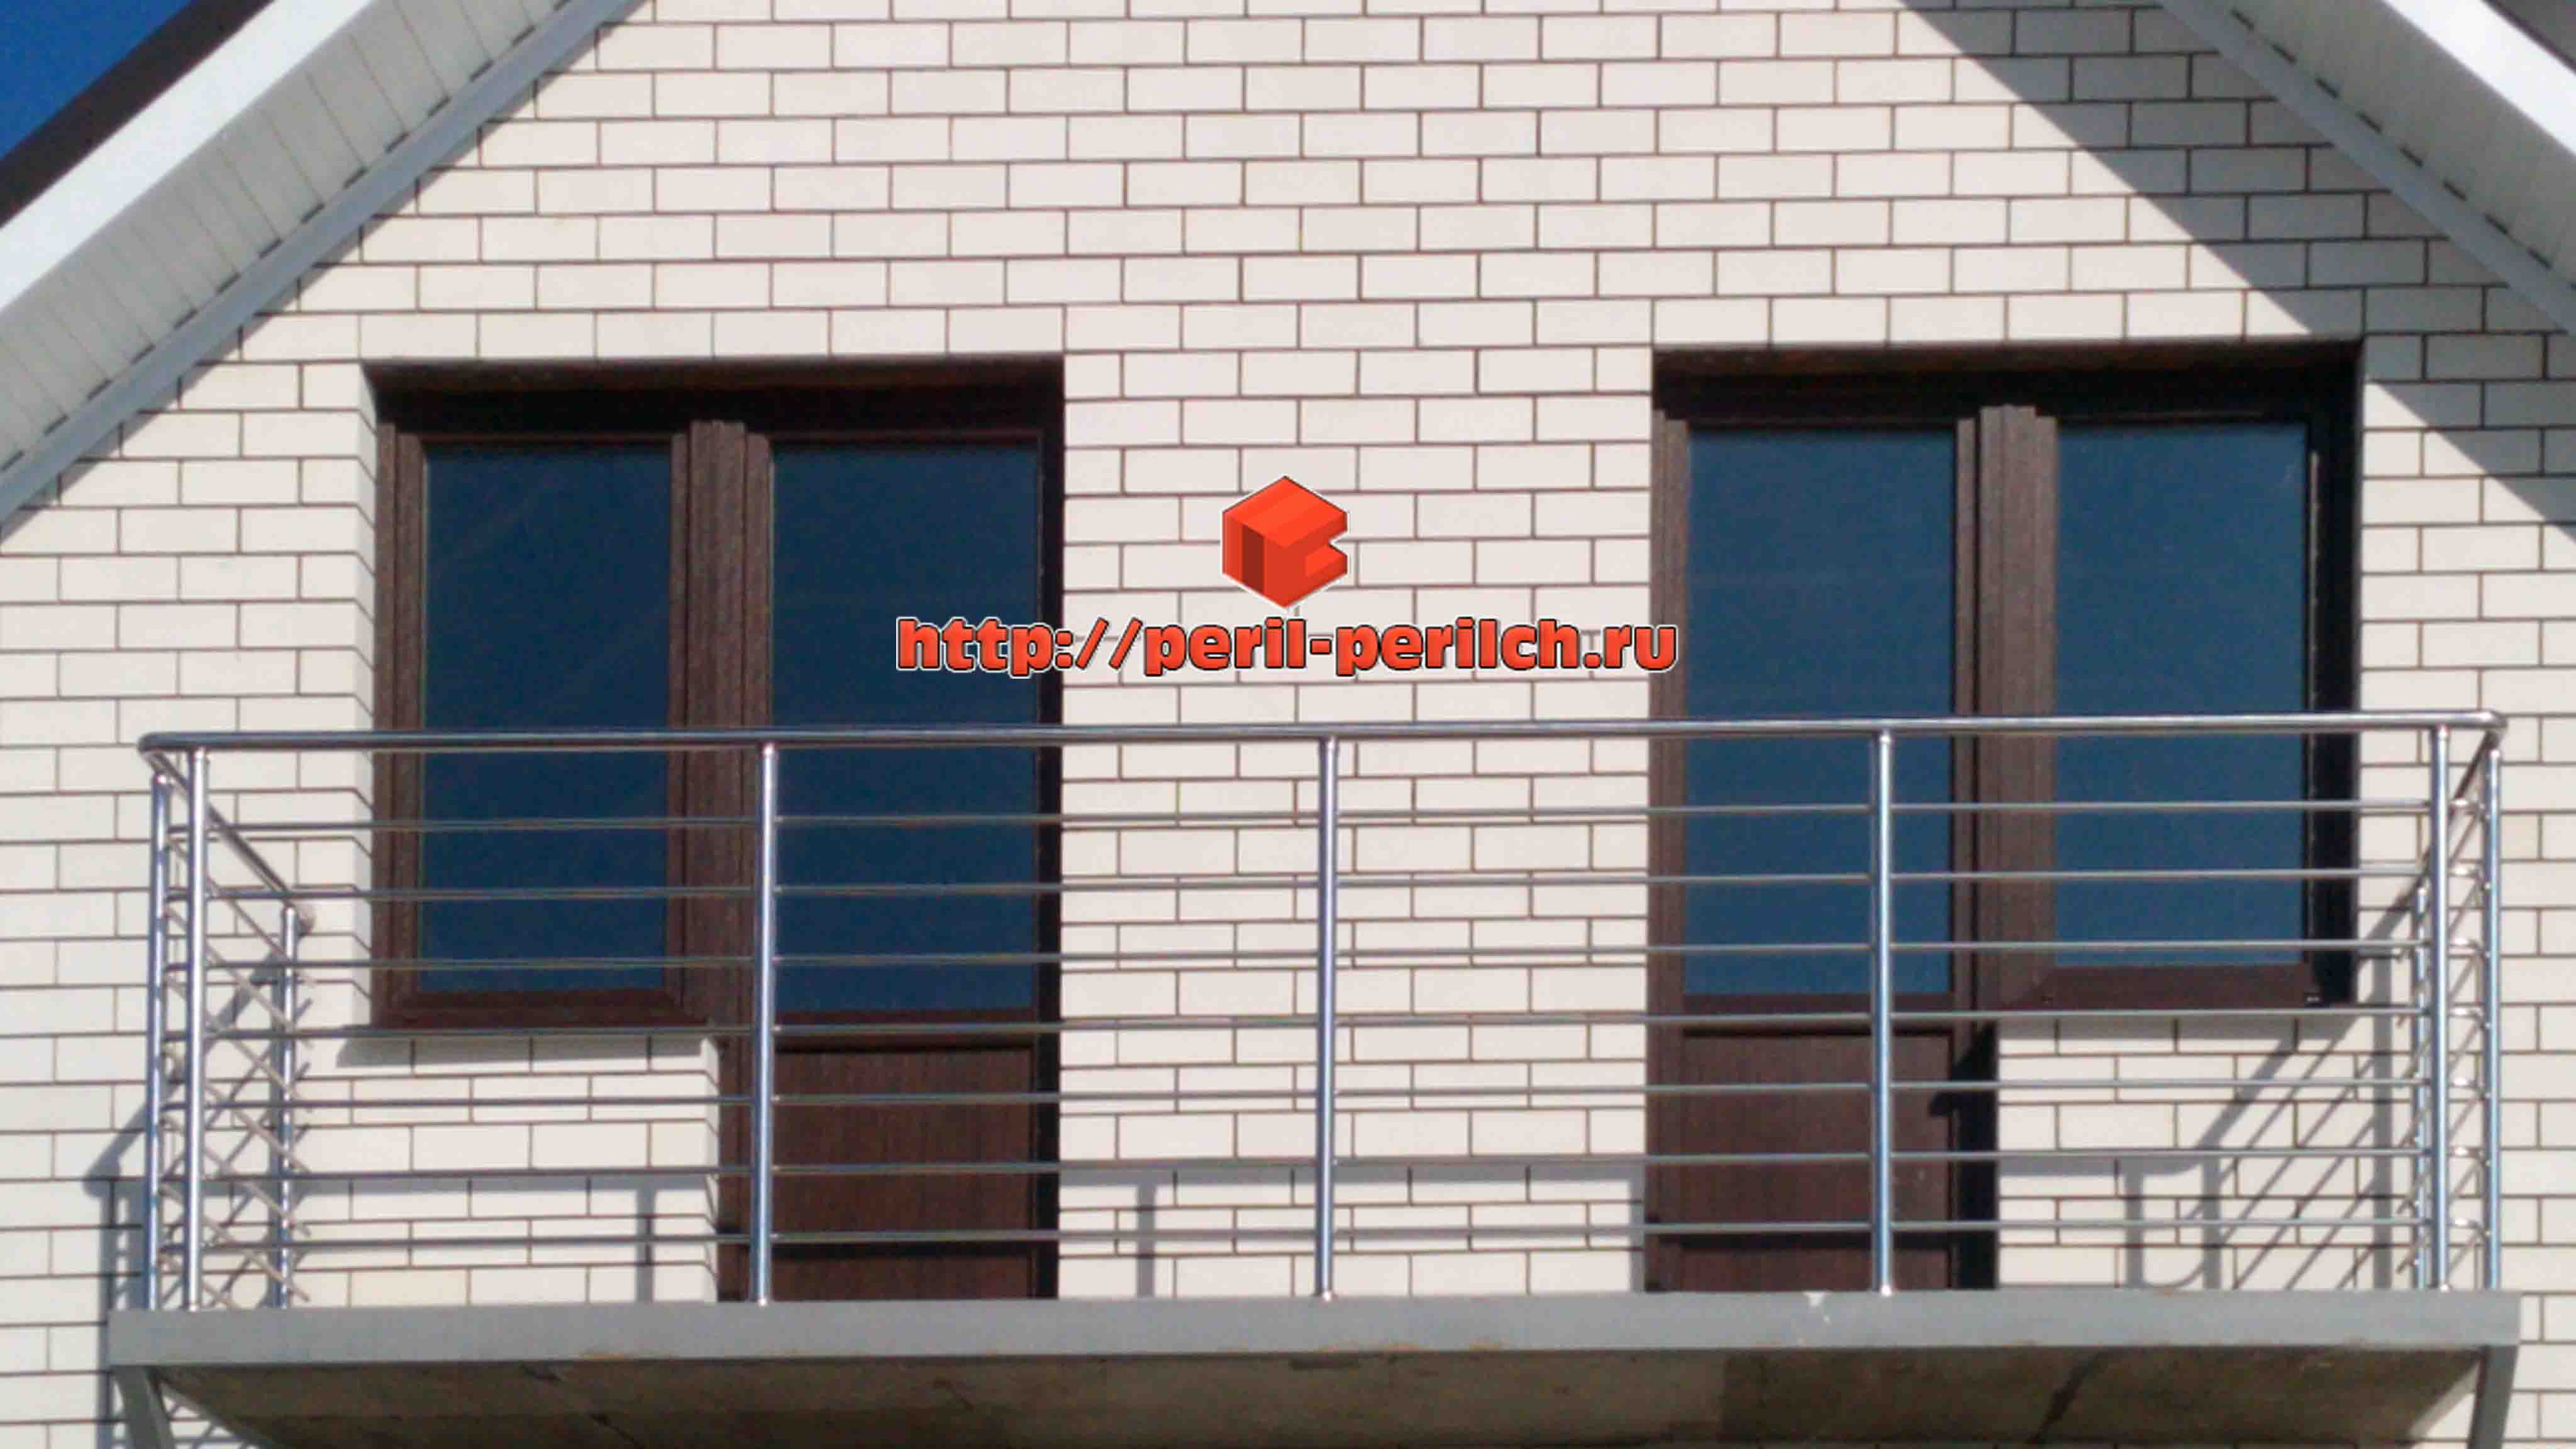 ograjdenie-balkona